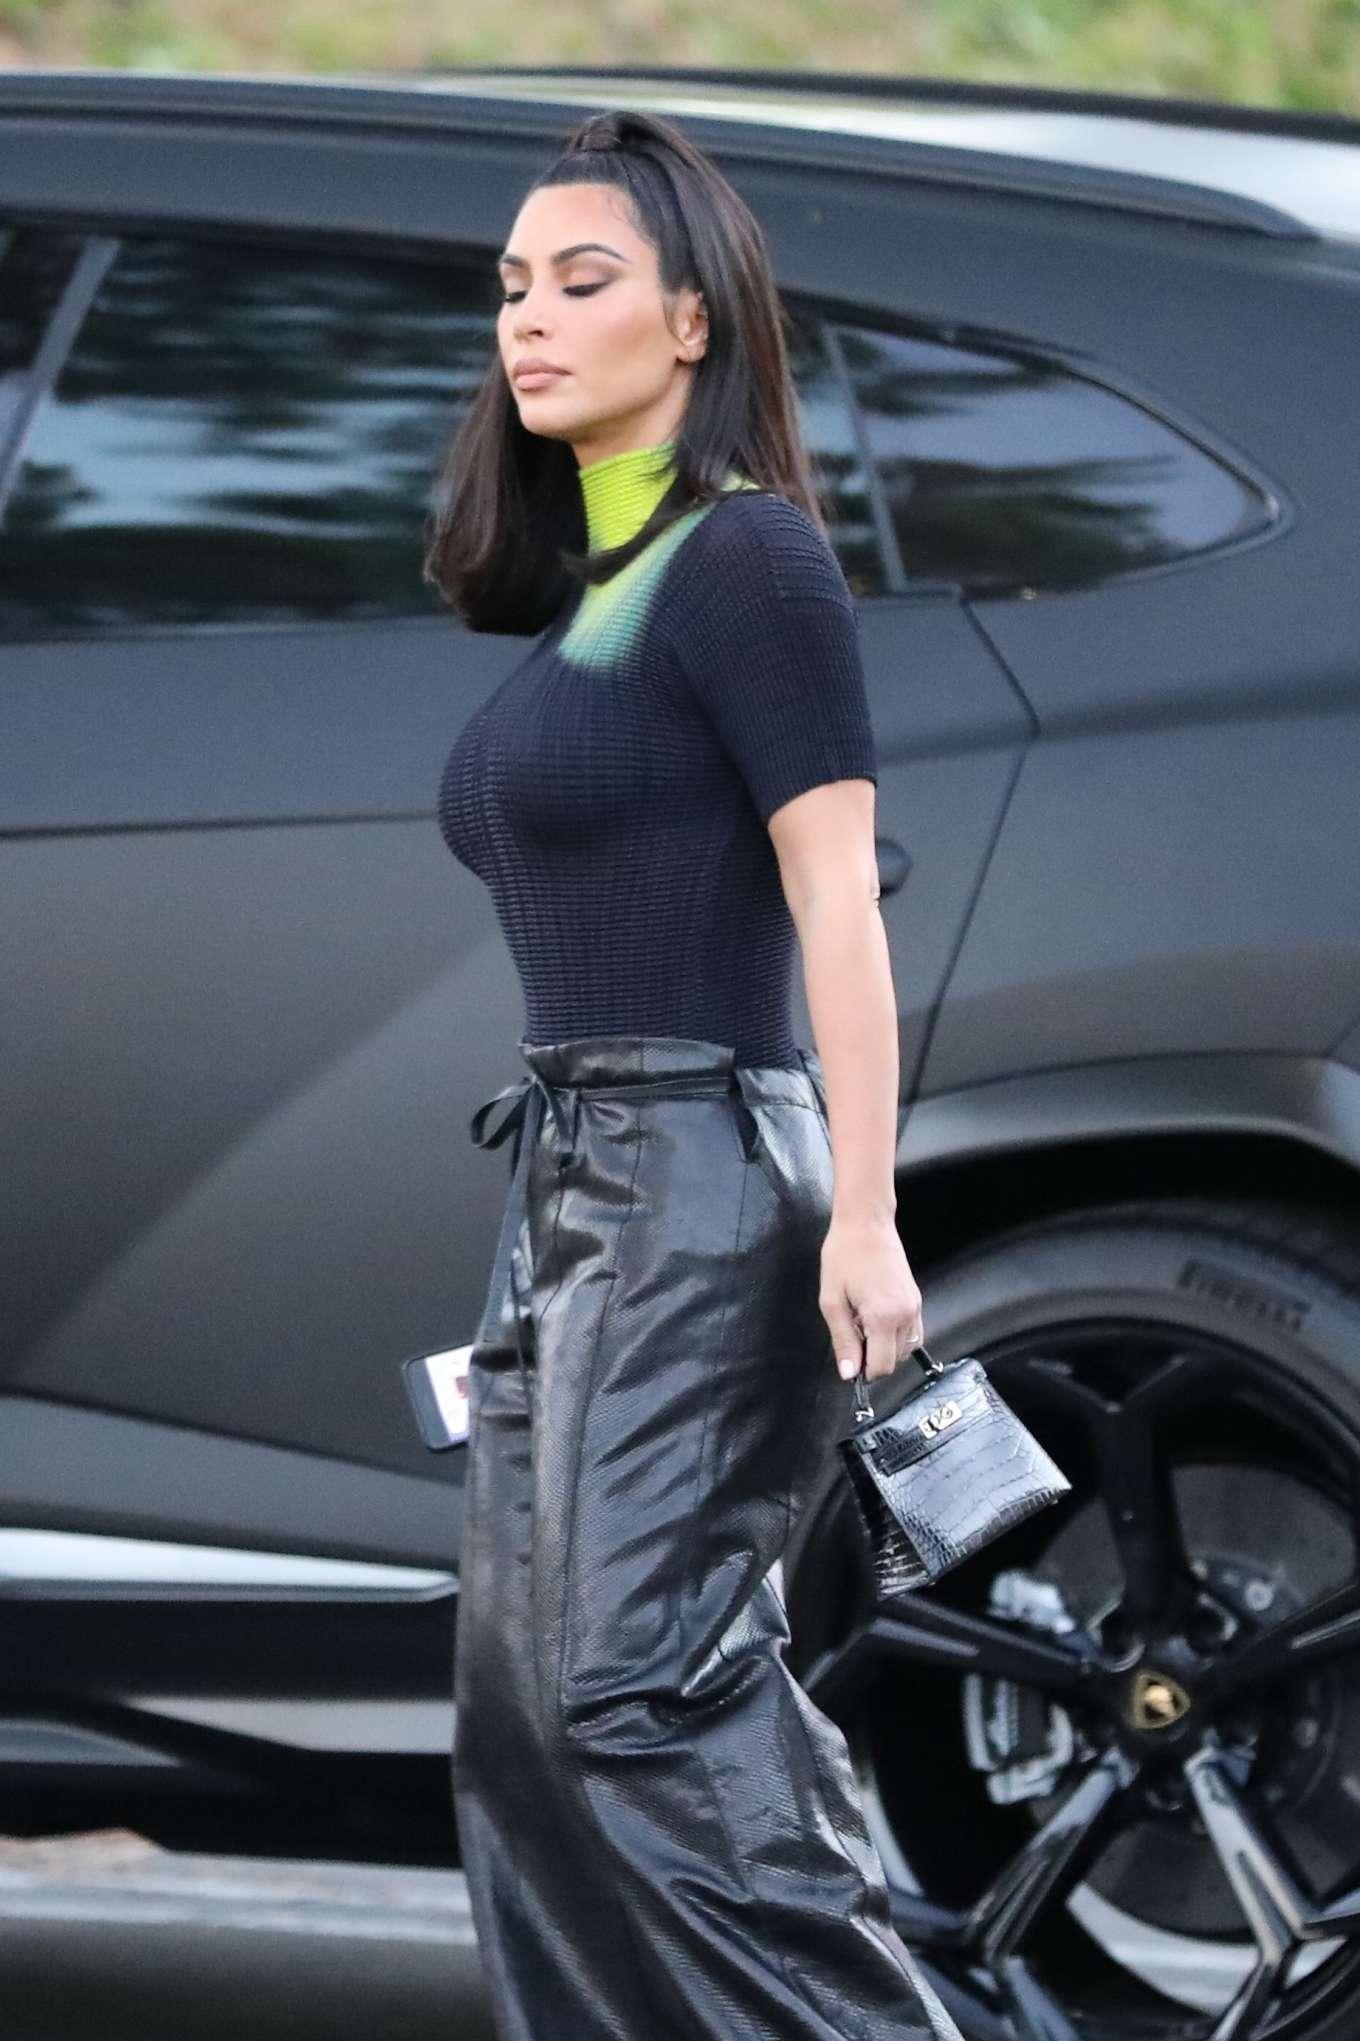 Kim Kardashian Arrives at the Commons Shopping Mall in Calabasas July 2019